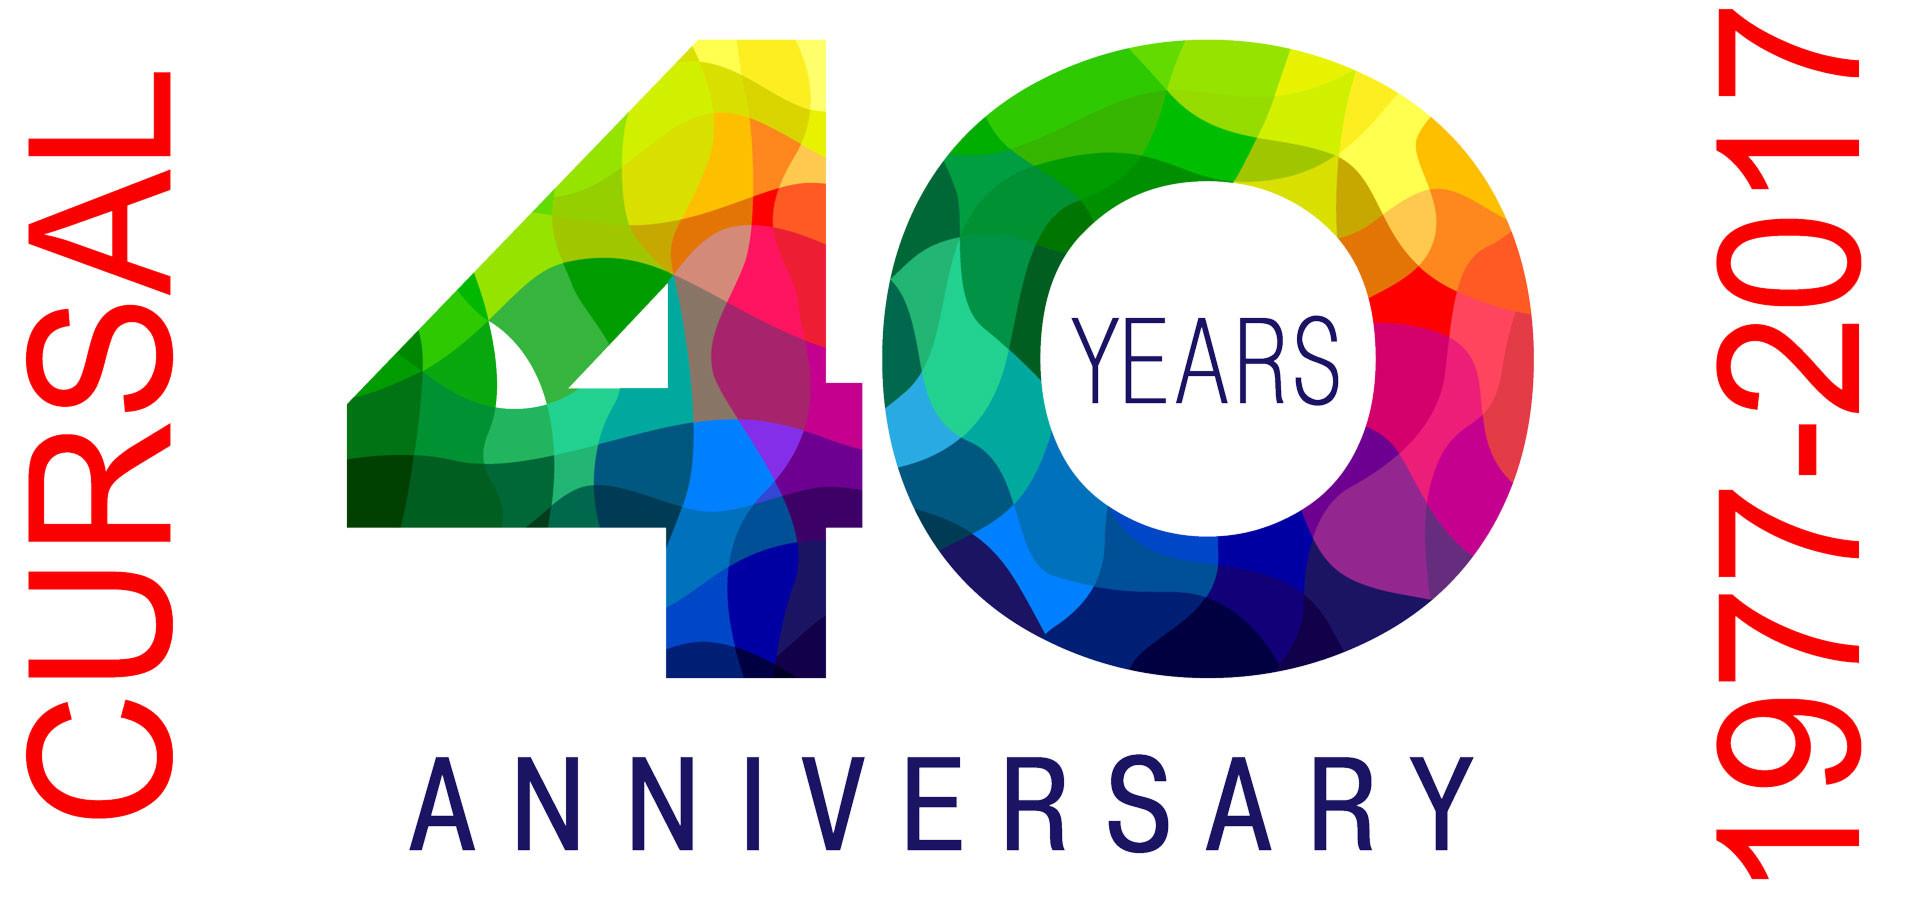 cursal-company-40-years- anniversary